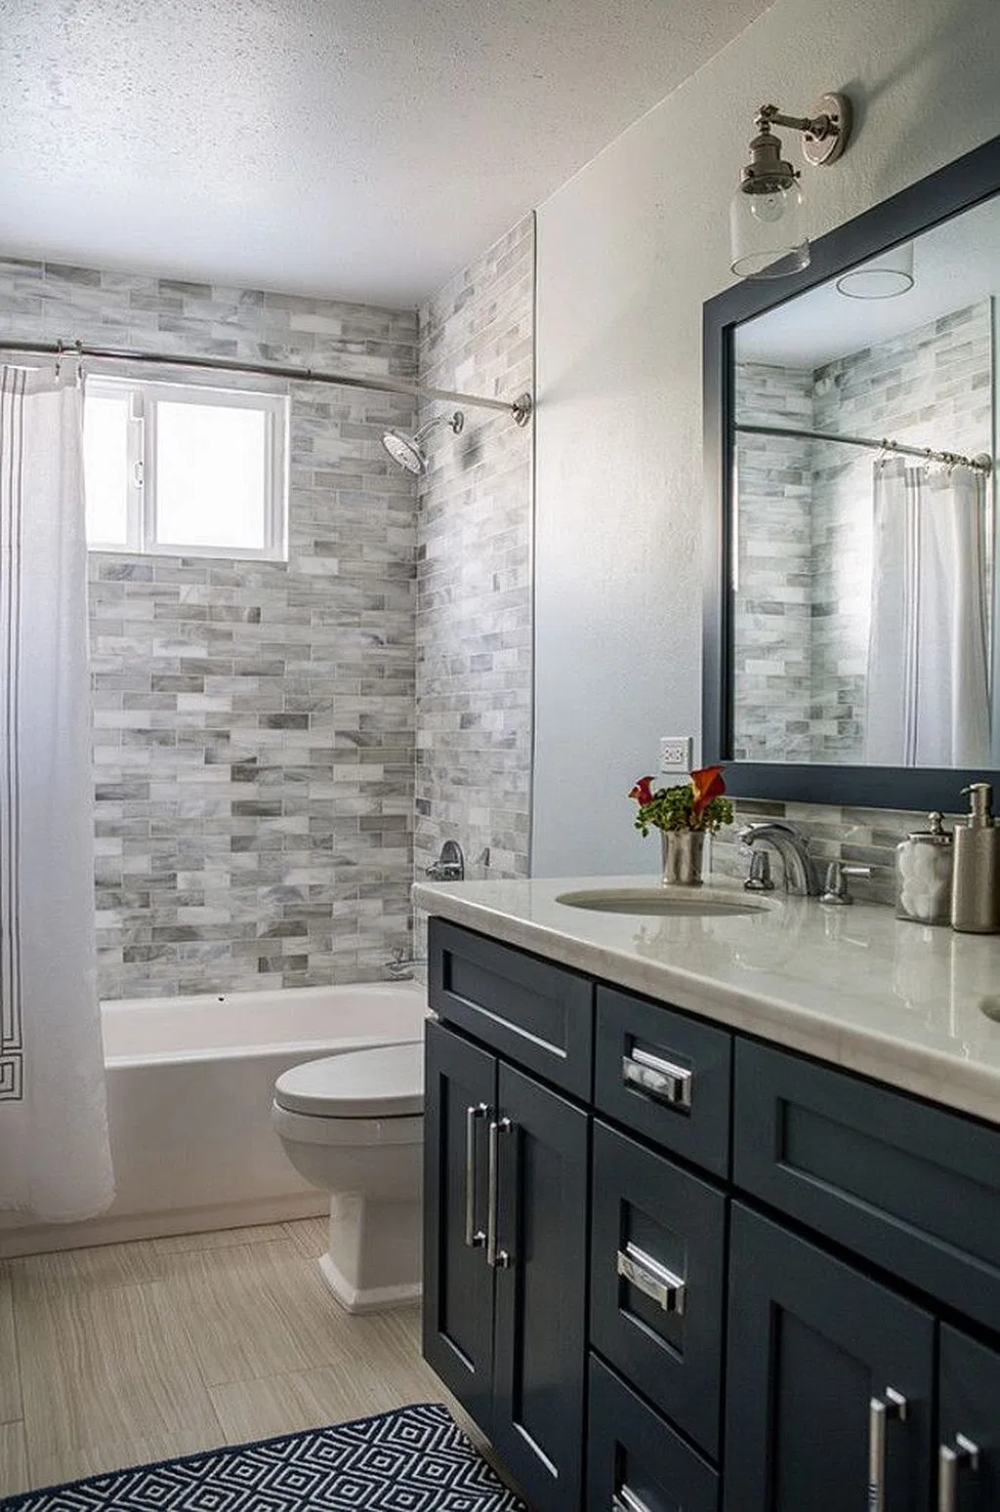 20 Guest Bathroom Decor Ideas 6 Gray Bathroom Decor Inexpensive Bathroom Remodel Bathroom Remodel Master